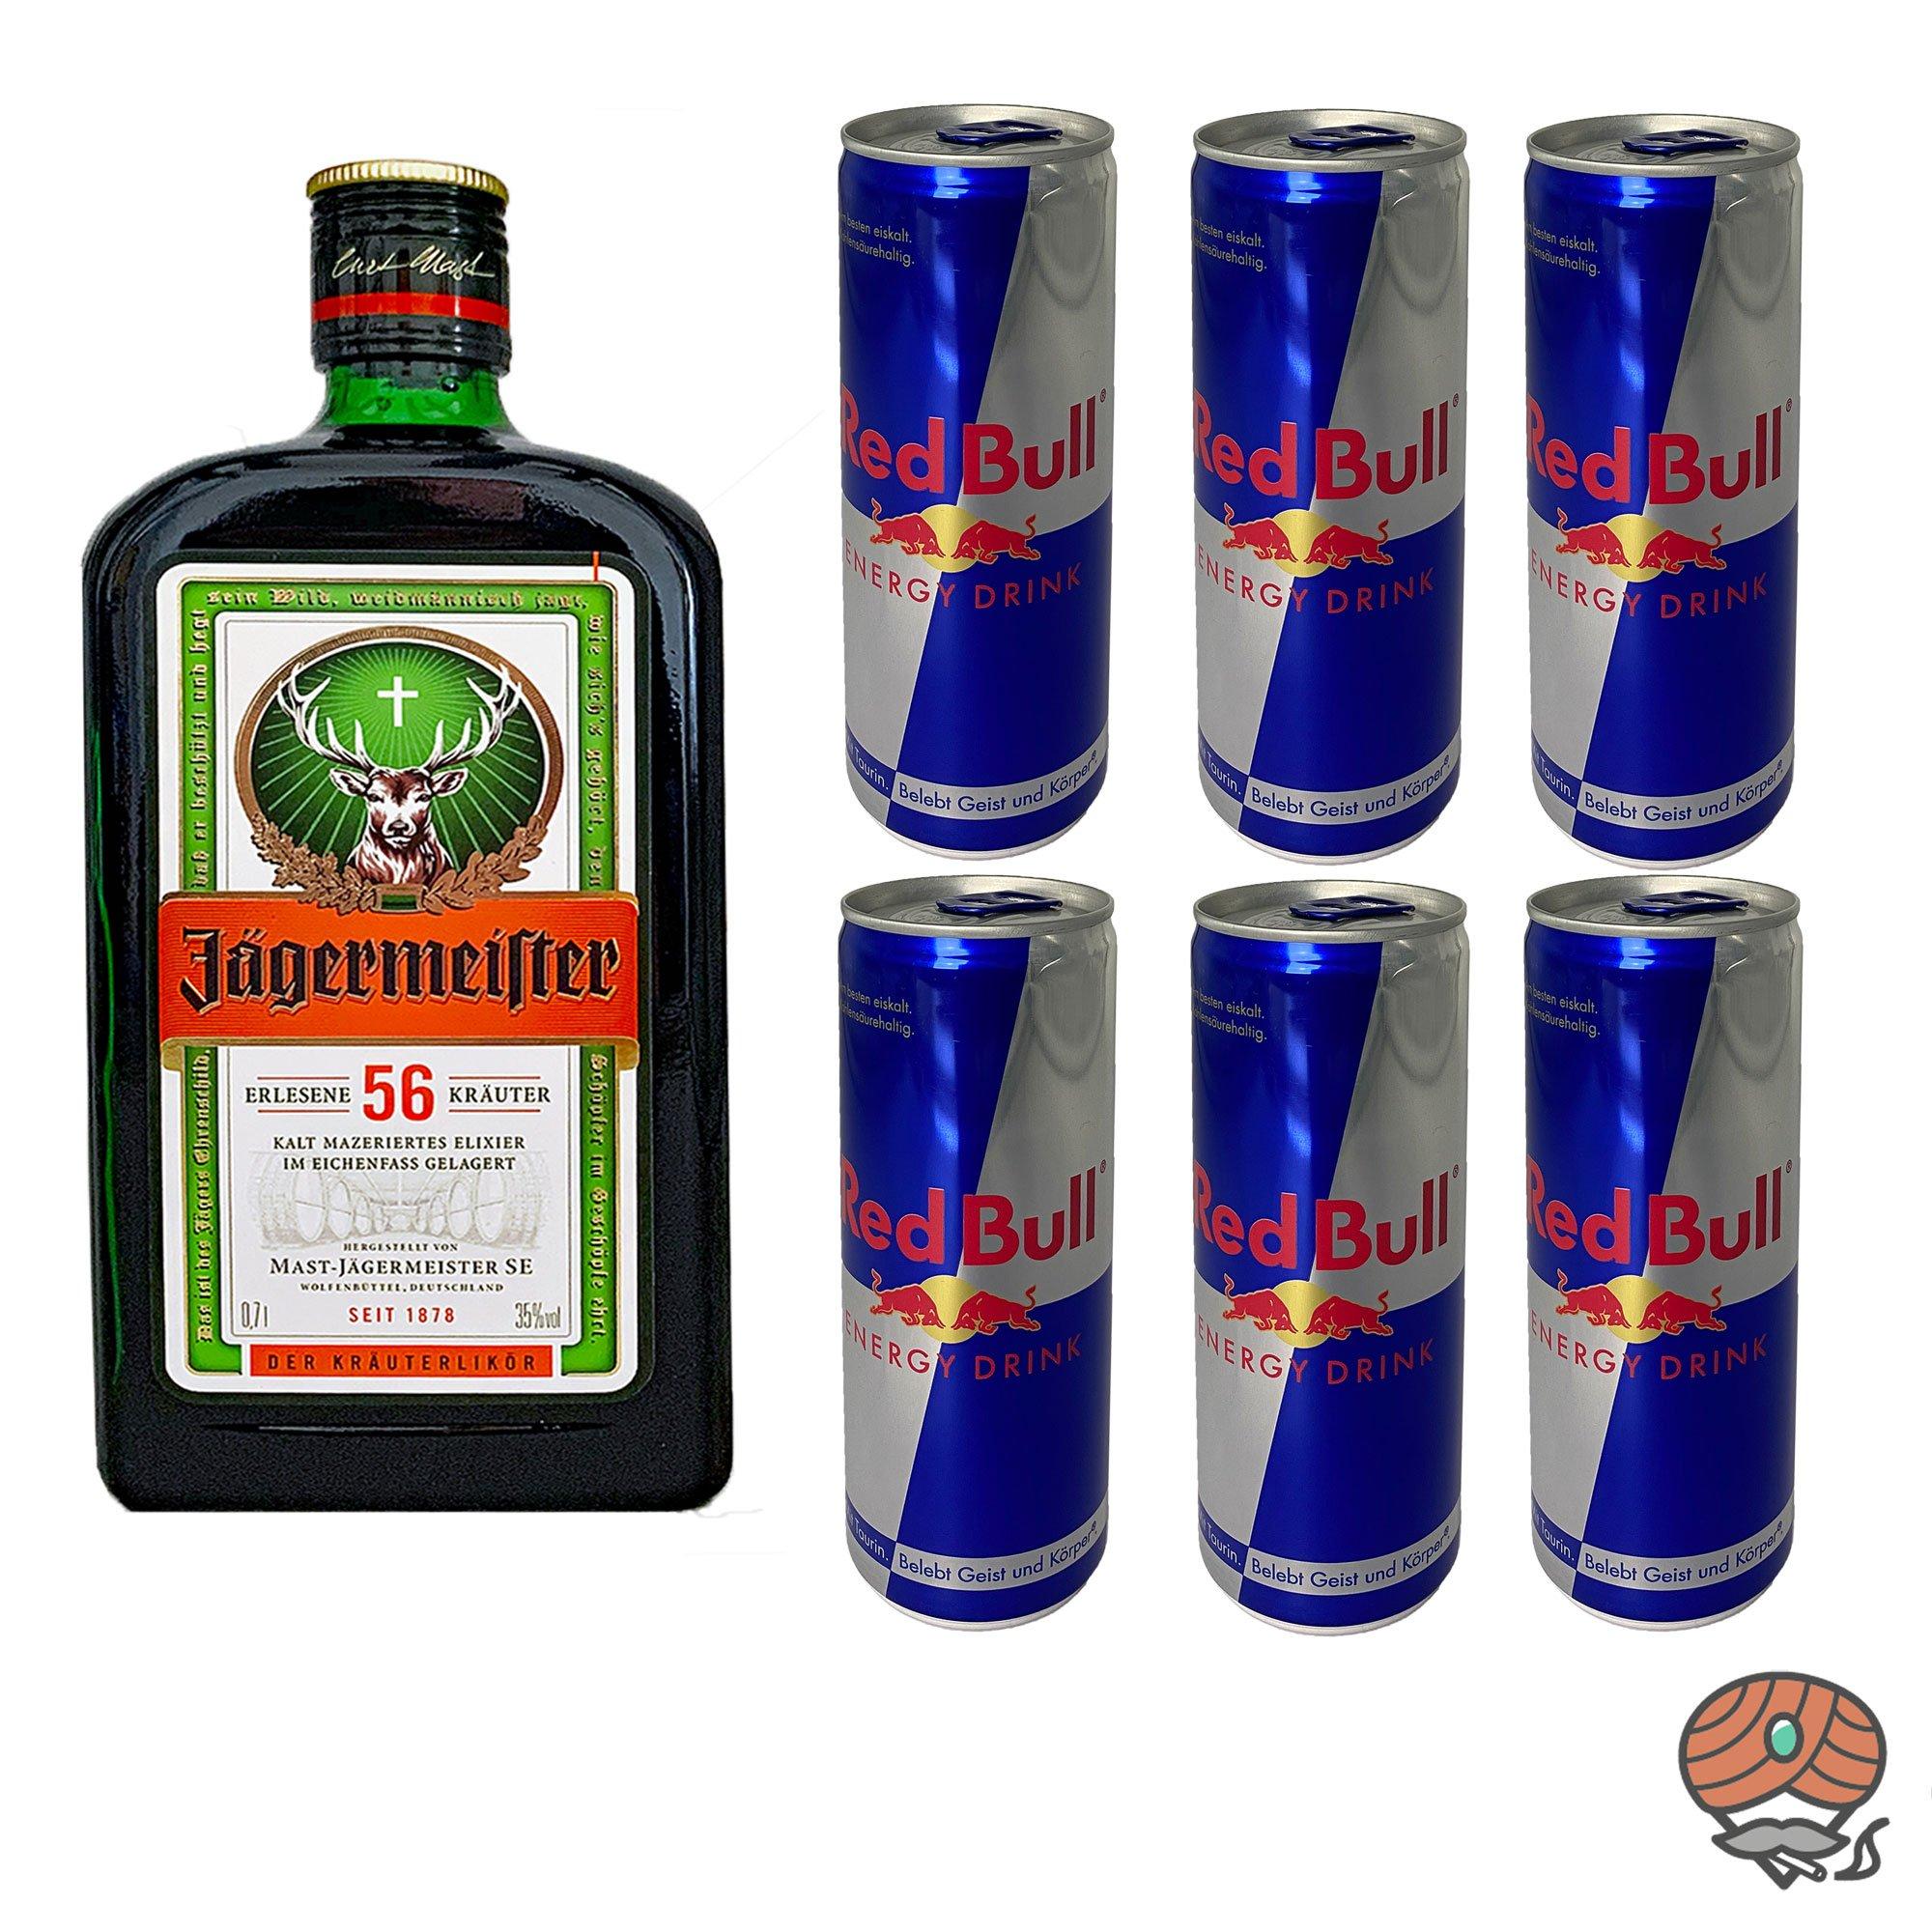 Jägermeister Red Bull (0,7l Jägermeister + 6 x Red Bull inkl. Pfand)